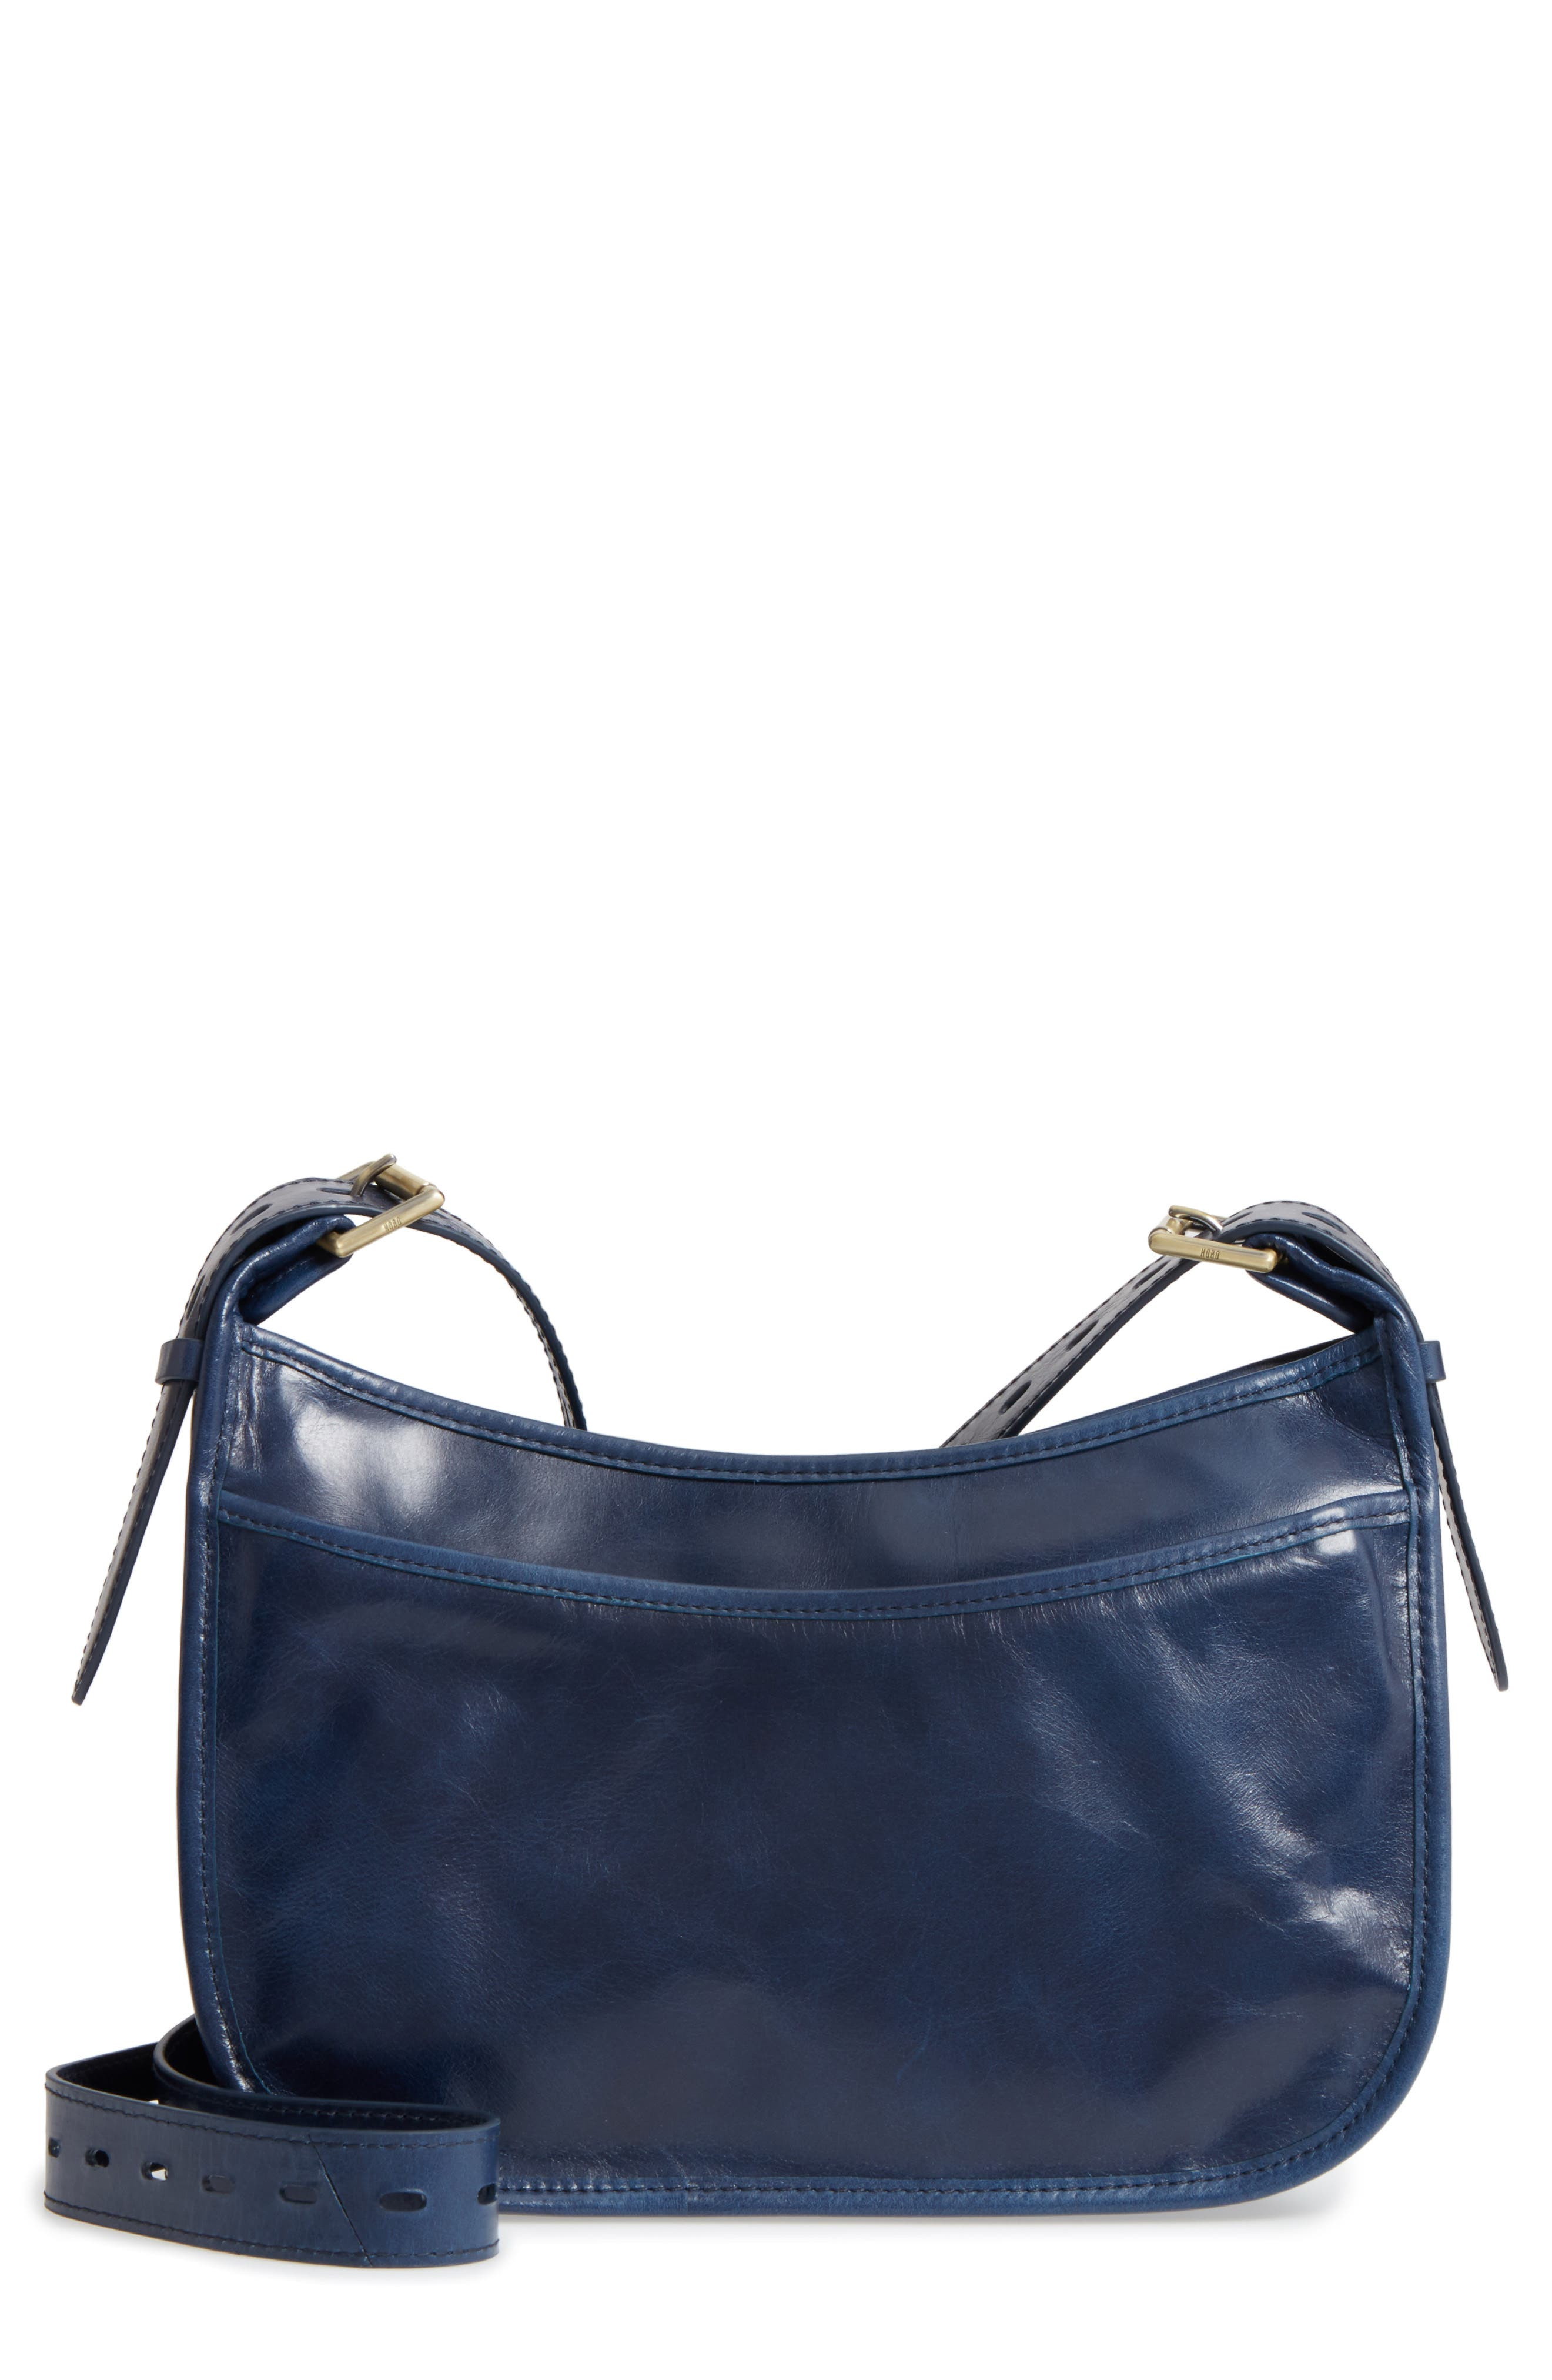 HOBO Chase Calfskin Leather Crossbody Bag